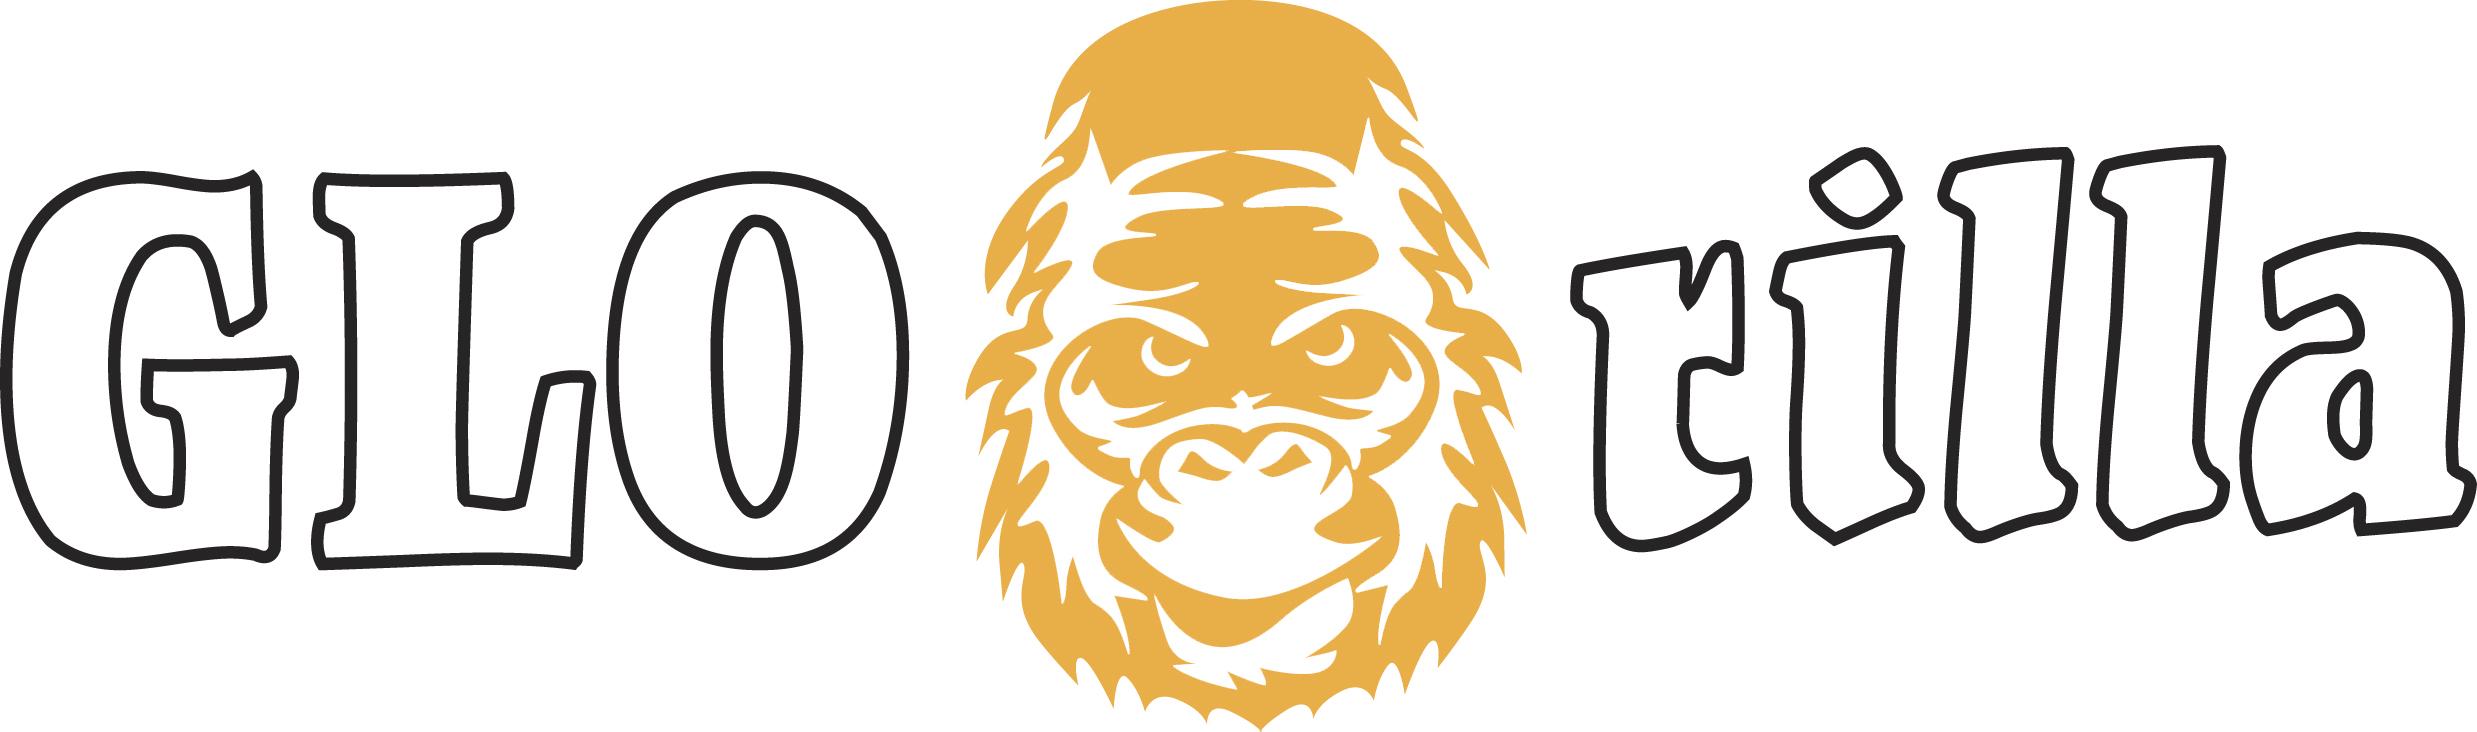 GLO-rilla logo